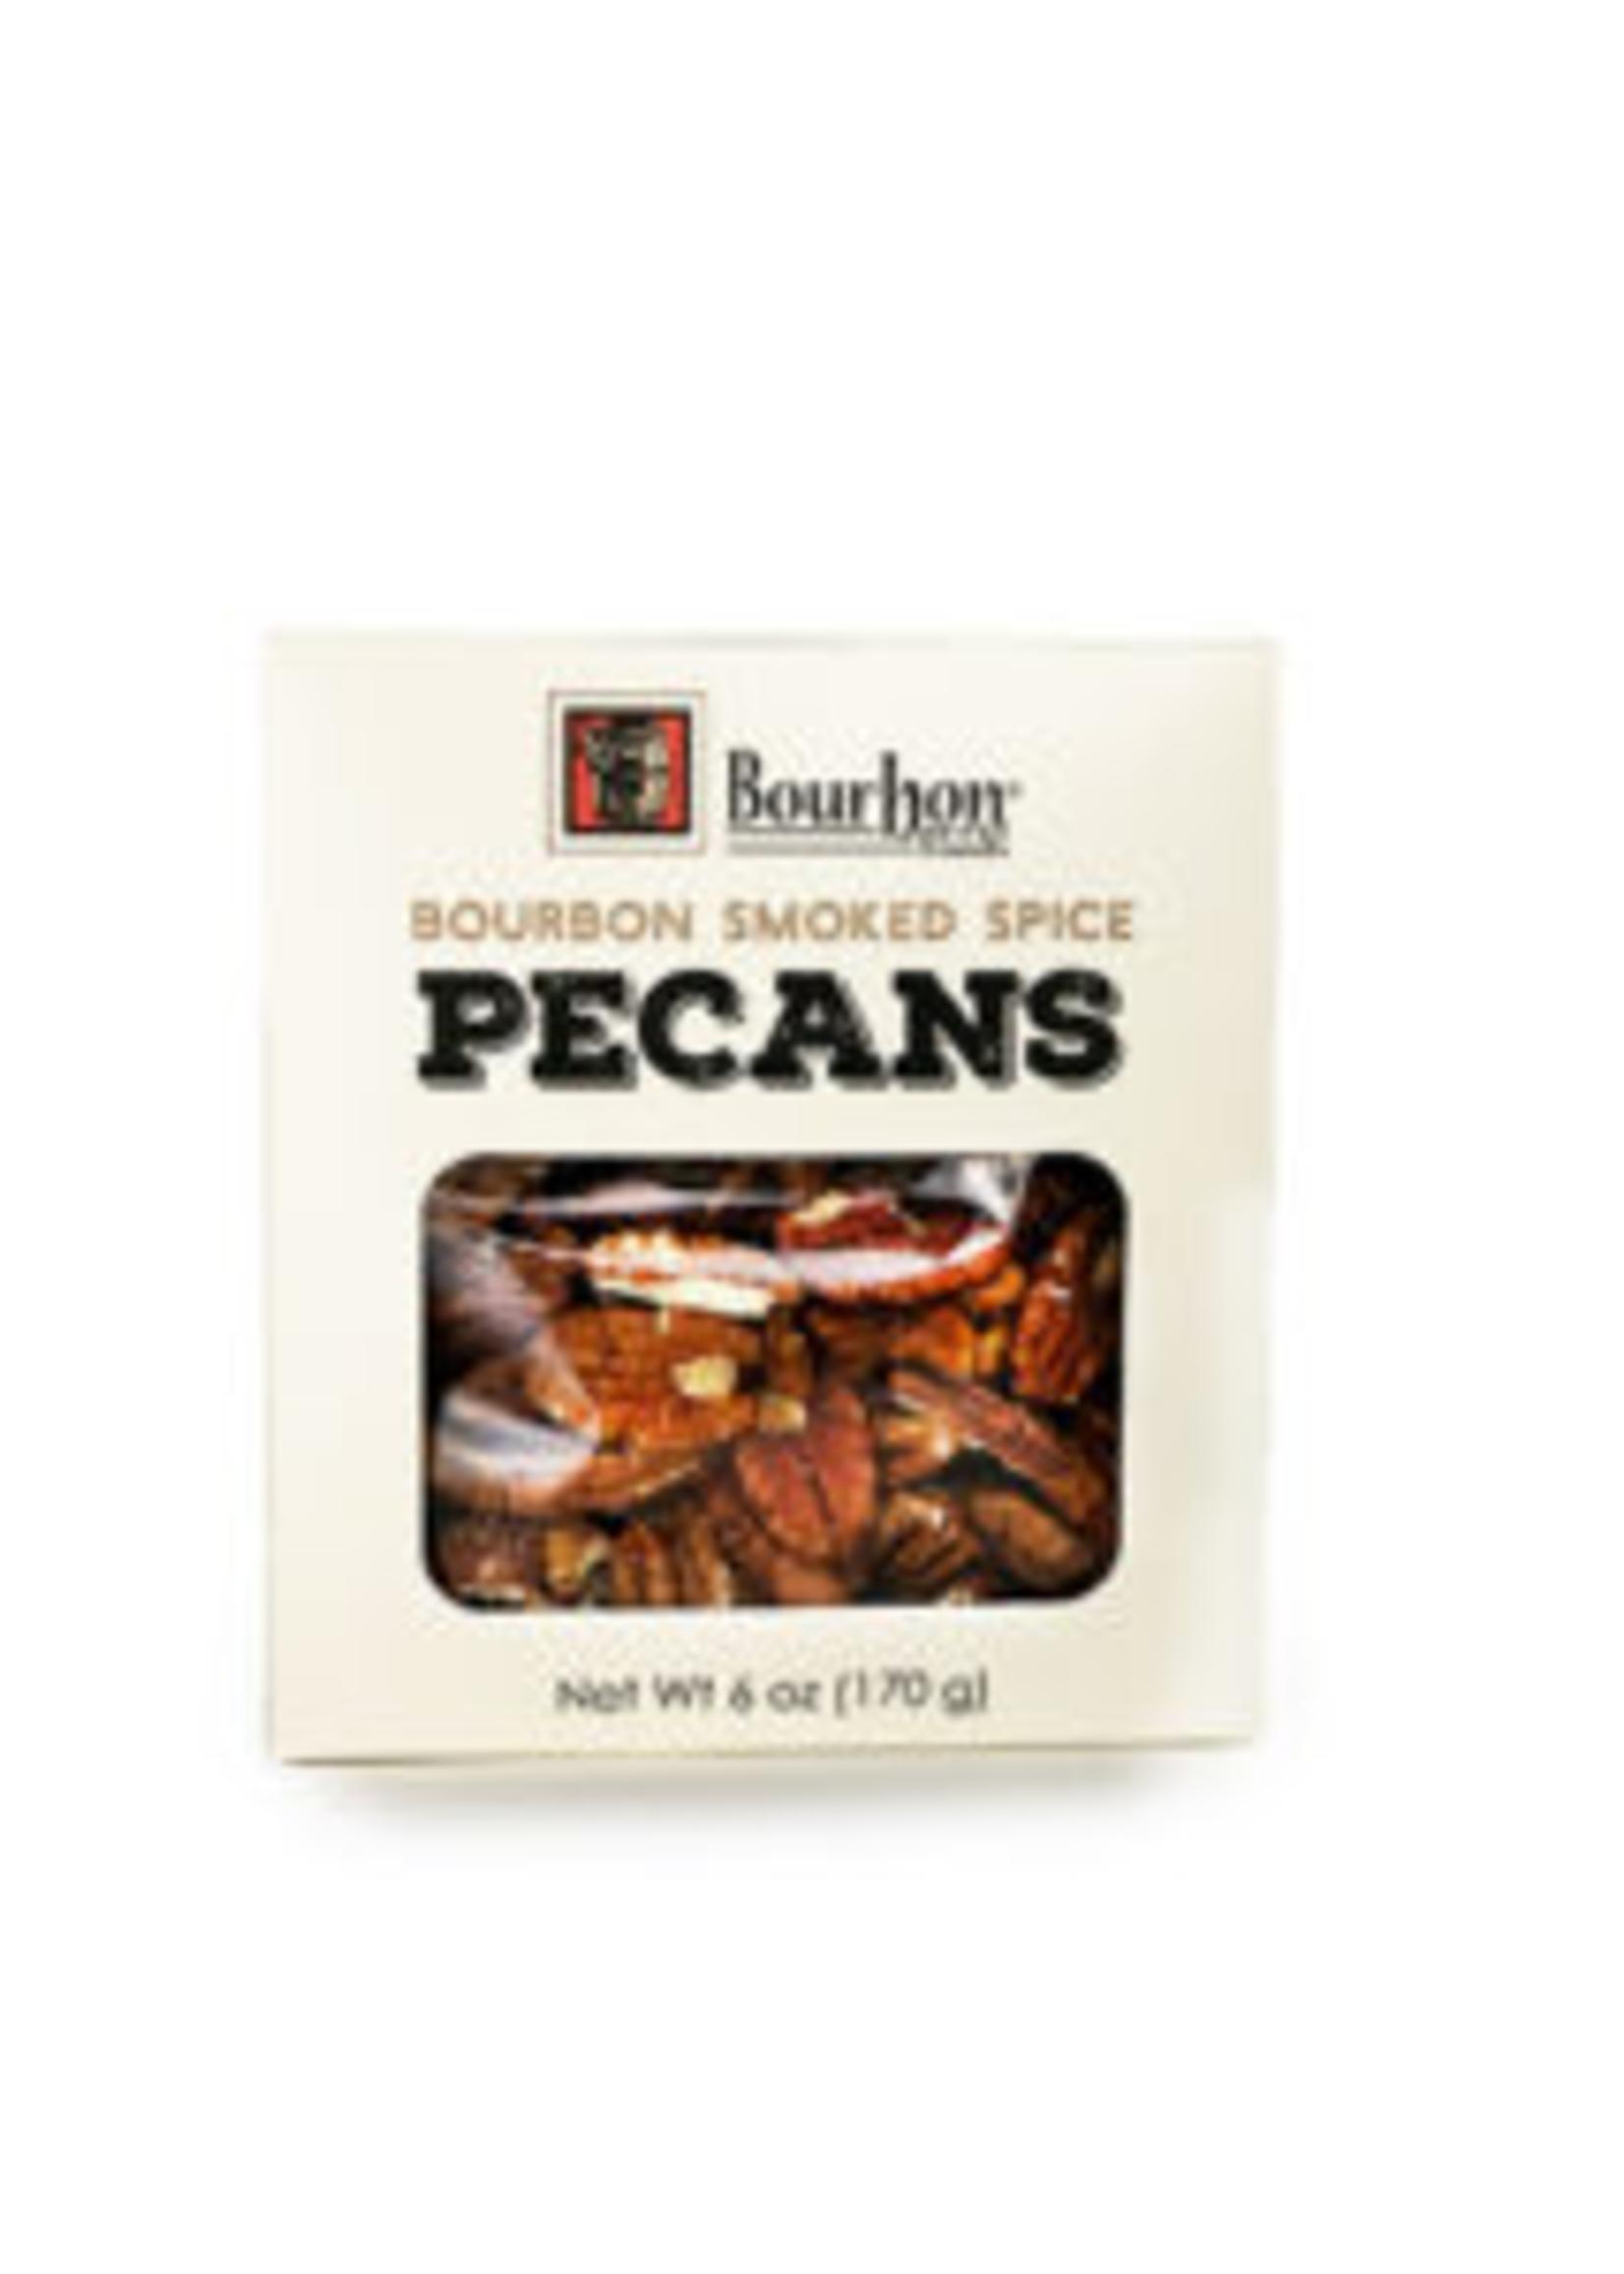 Bourbon Spiced Pecans - 6 OZ Box